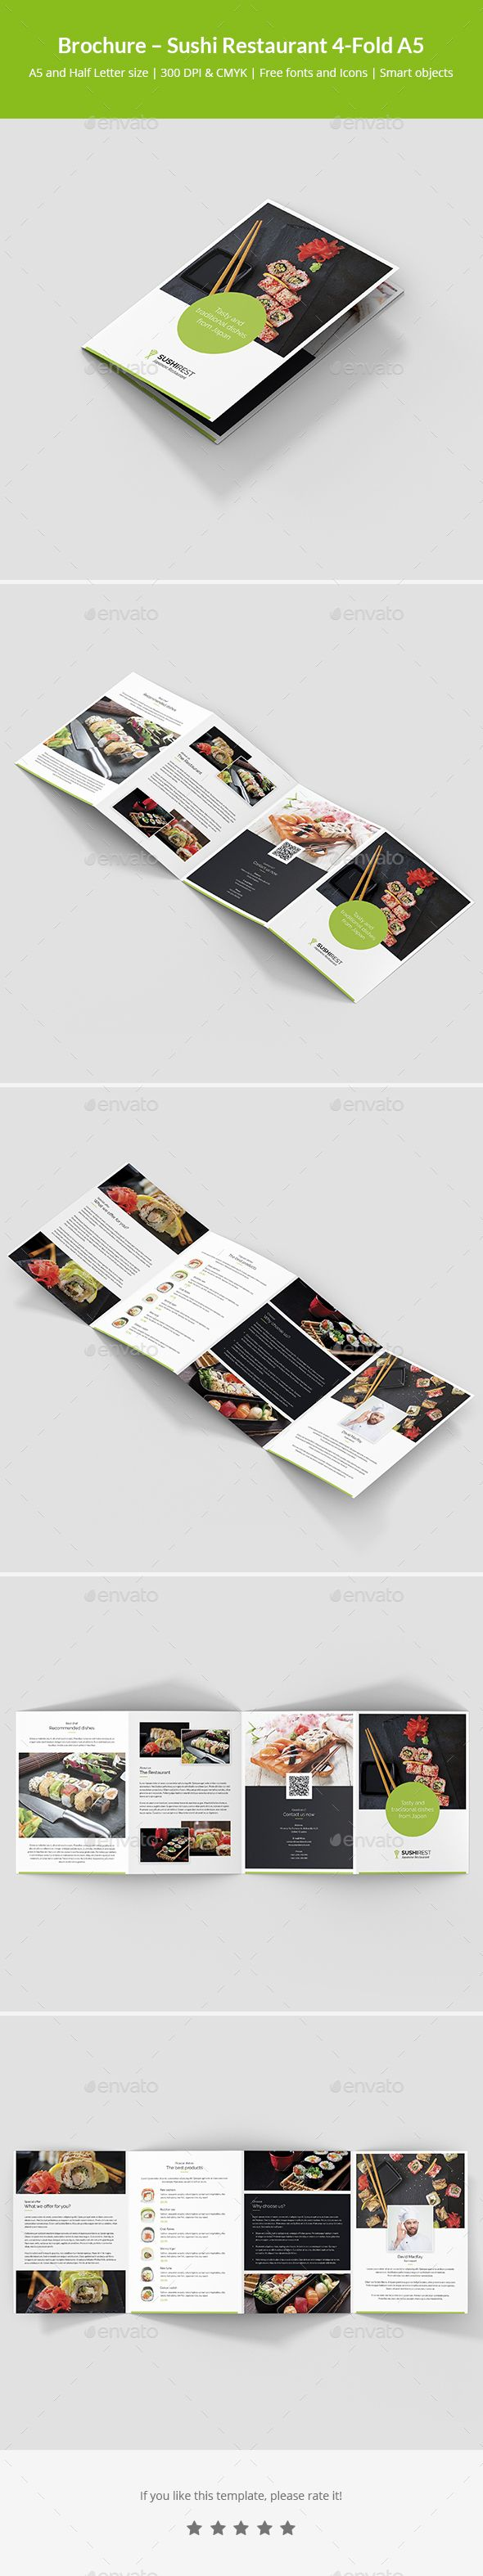 Brochure Sushi Restaurant Fold A Sushi Restaurants - A5 brochure template